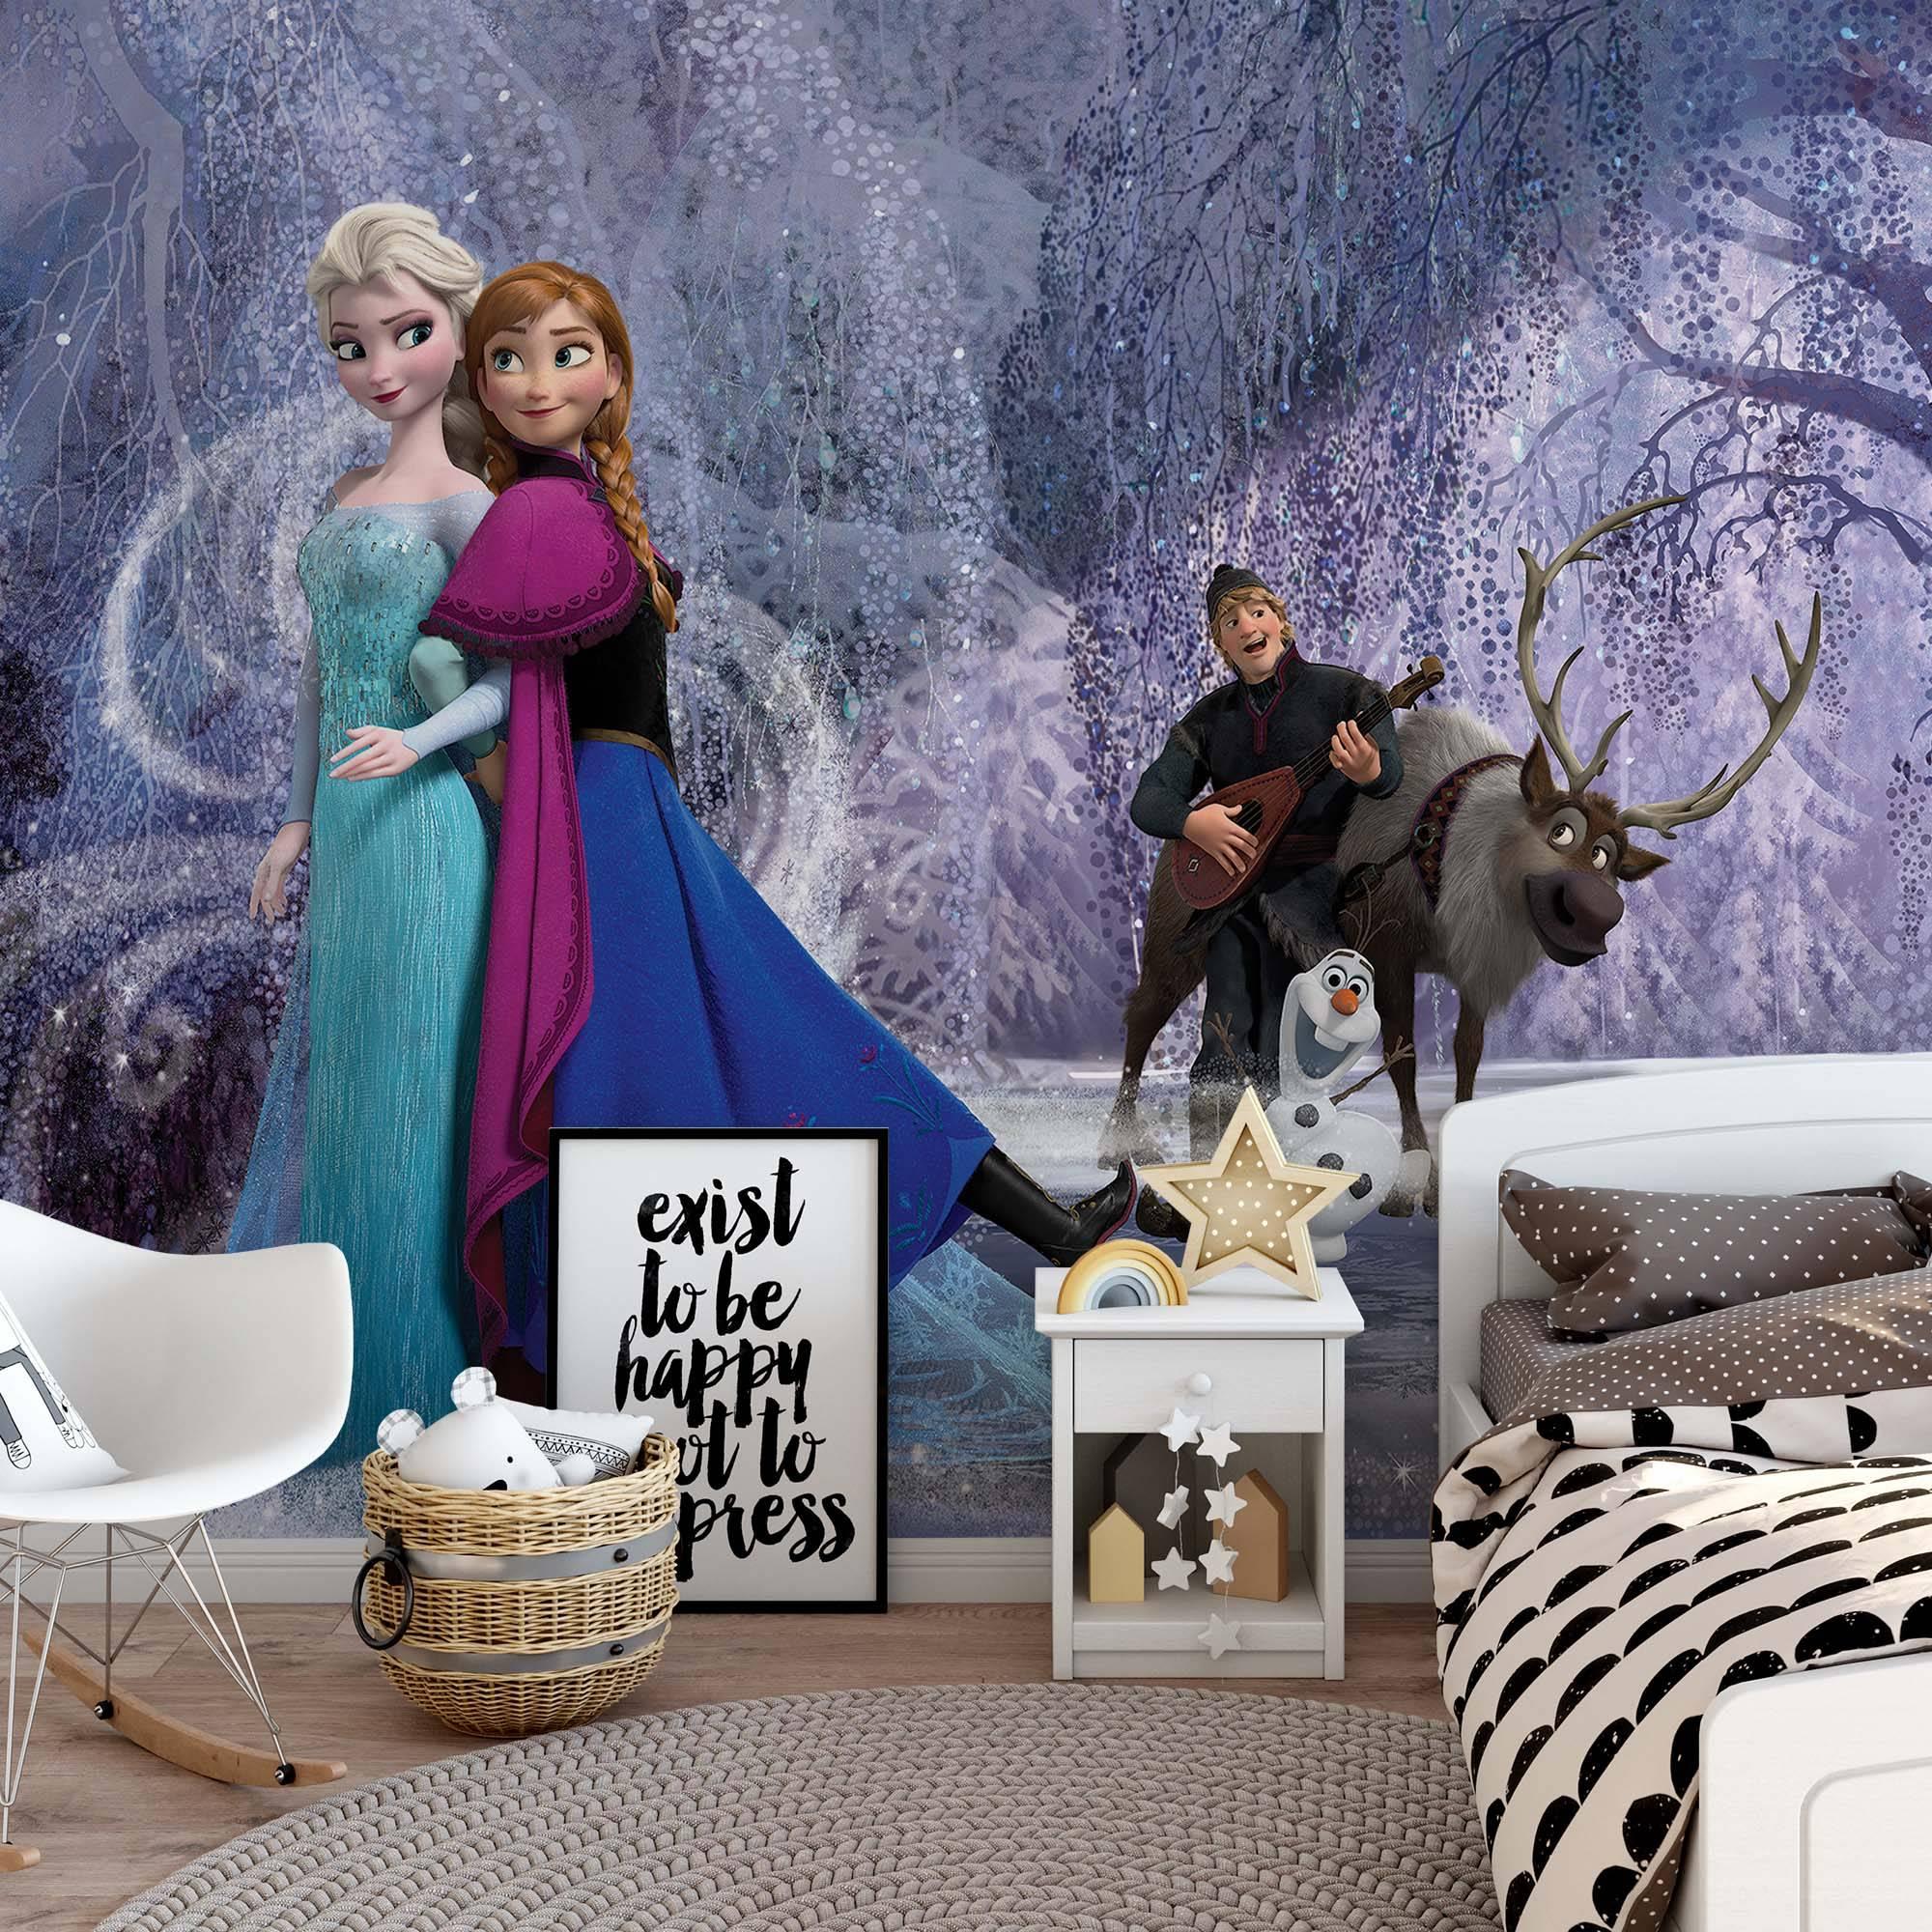 xl elsa frozen by disney photo wall mural 4210 1 p